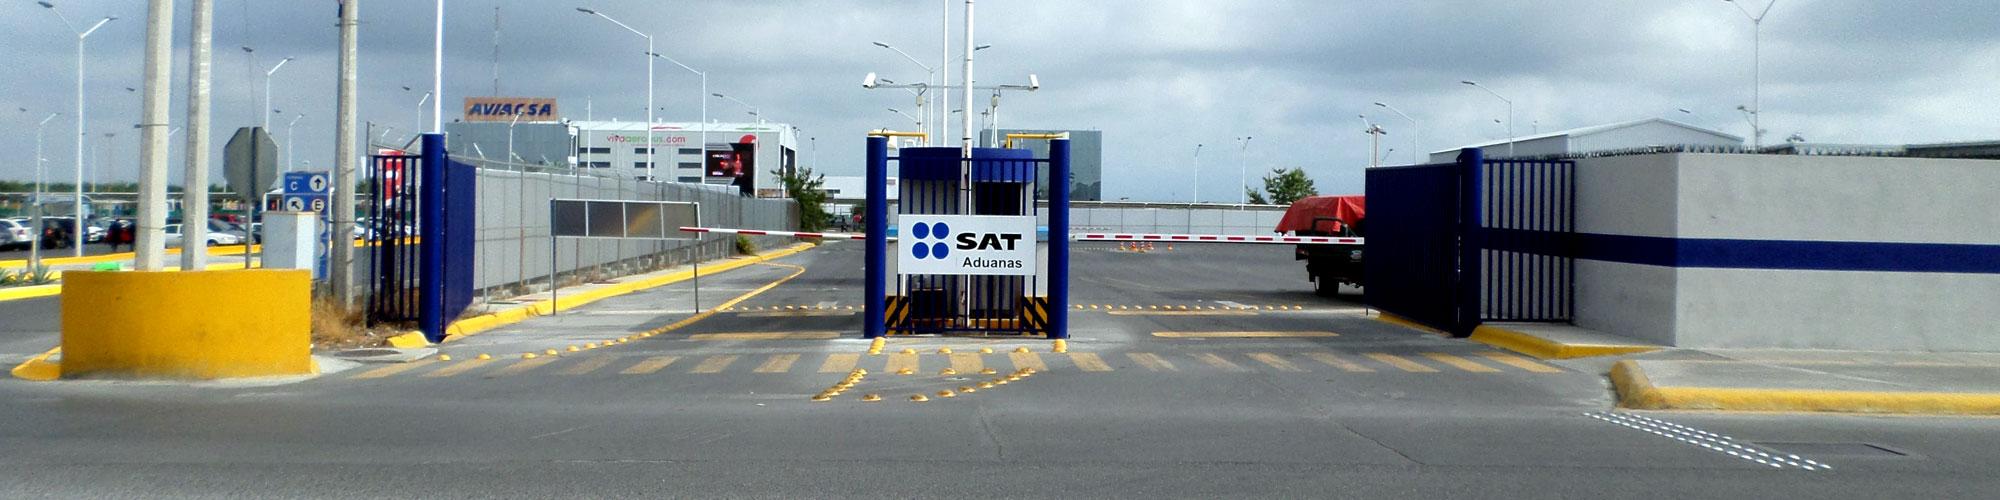 cobertura, aduanas, puertos, almacen, bodegas, aerea, maritima, terrestre, importar, exportar, agencia aduanal, mexico